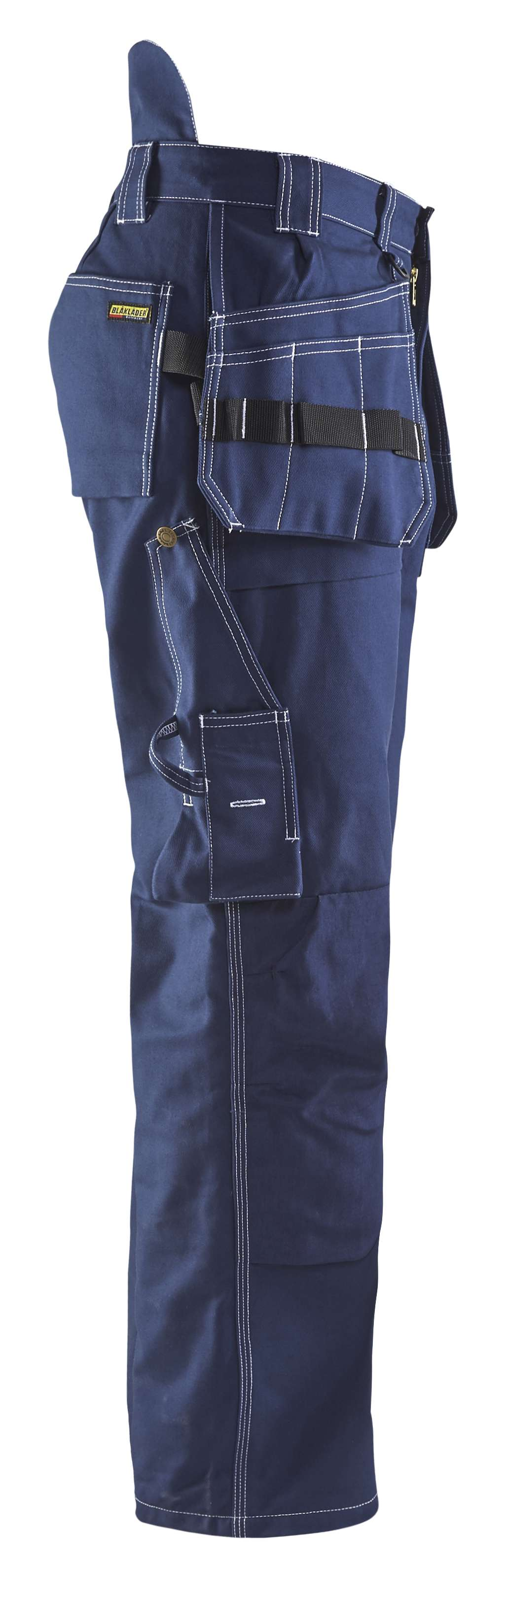 Blaklader Winterbroeken 15151370 marineblauw(8800)